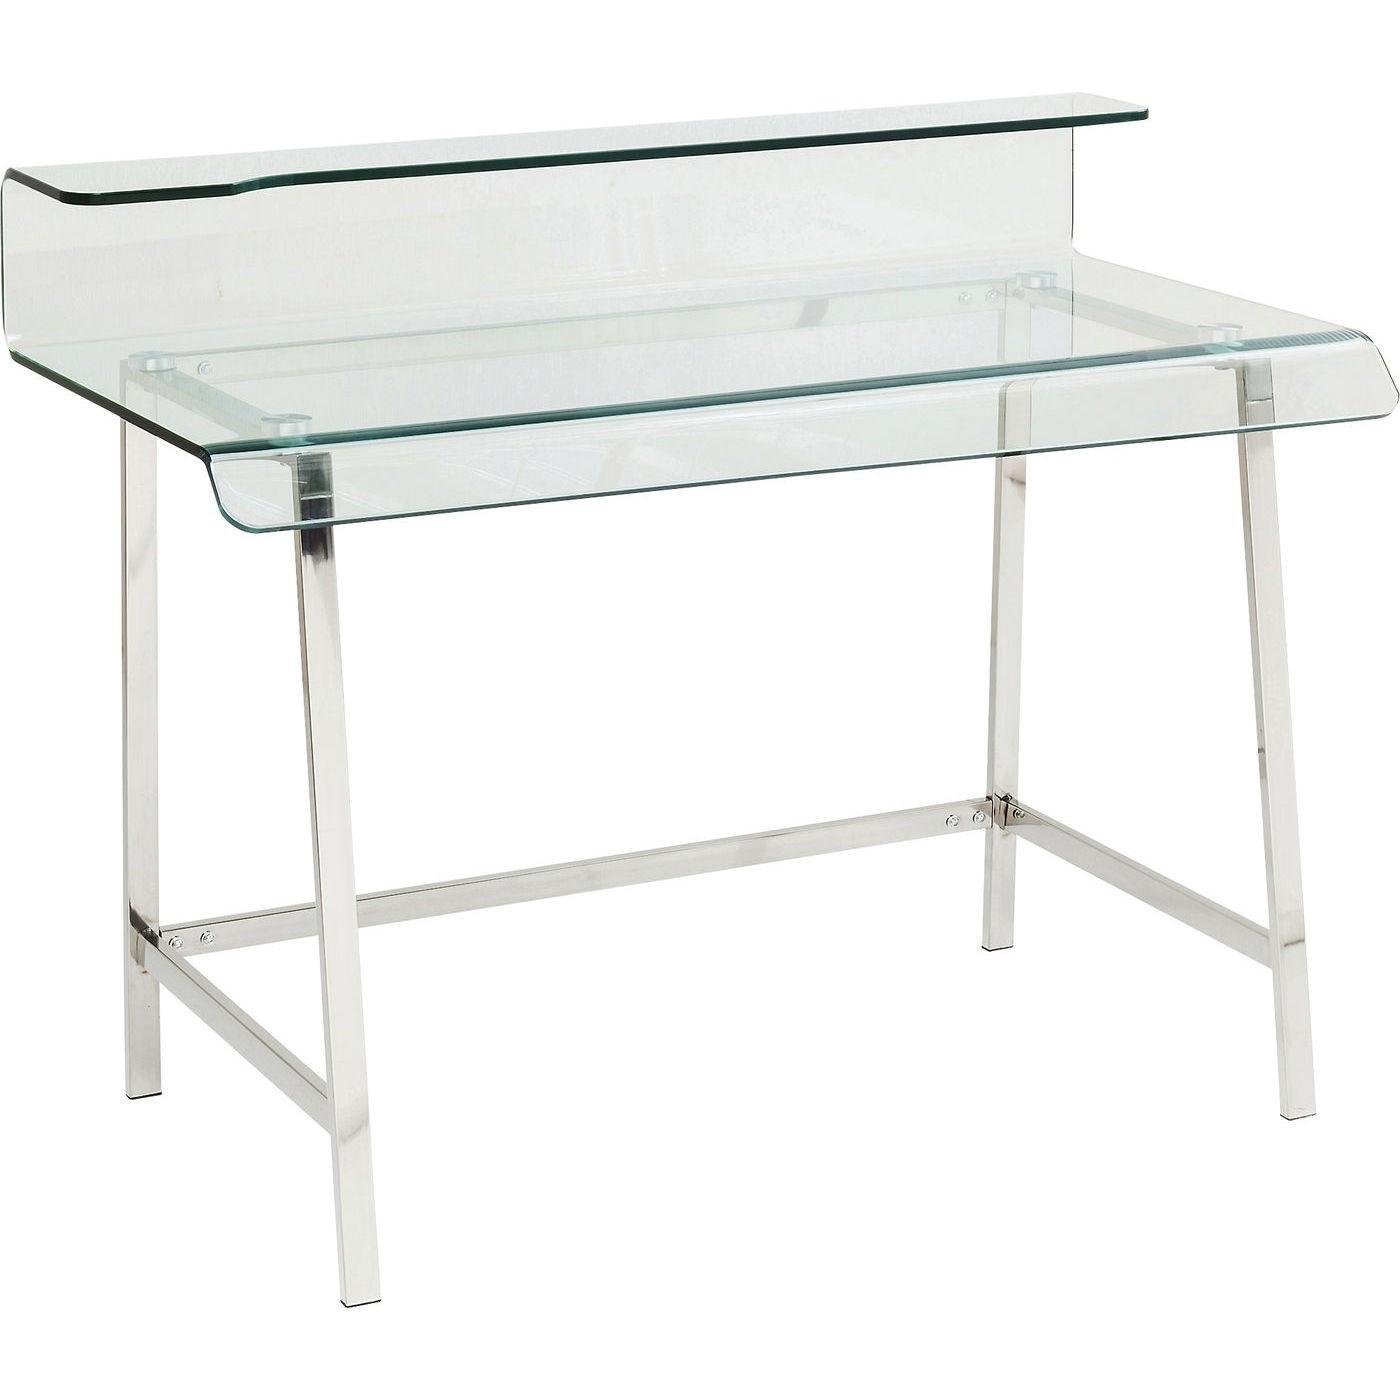 Bureau en verre Visible Clear Kare Design